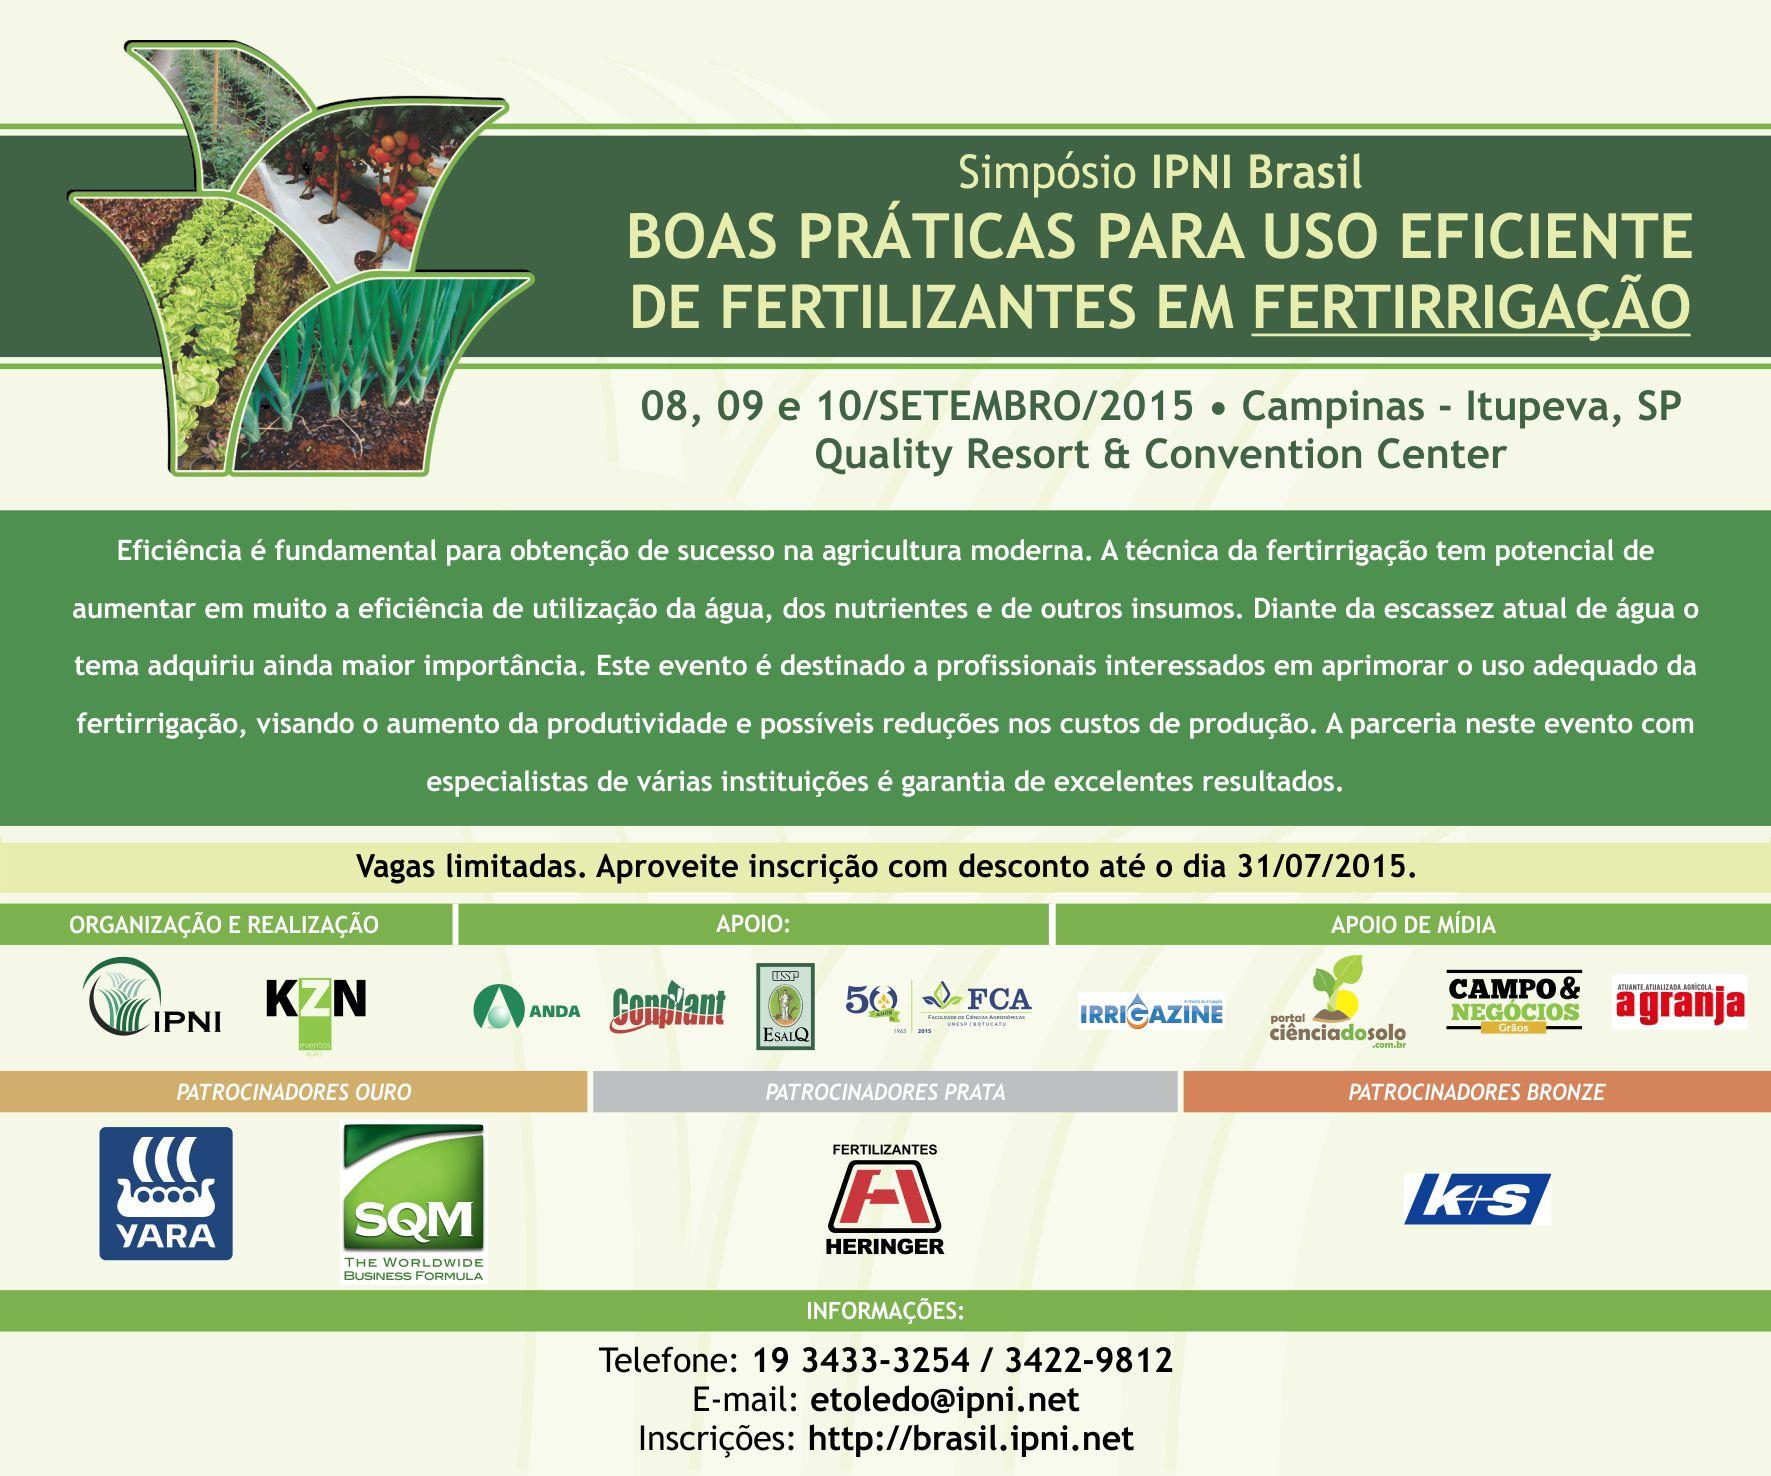 ANUNCIO_300X250_SIMP_REG_ IPNI_BRASIL_FERTIRRIGACAO